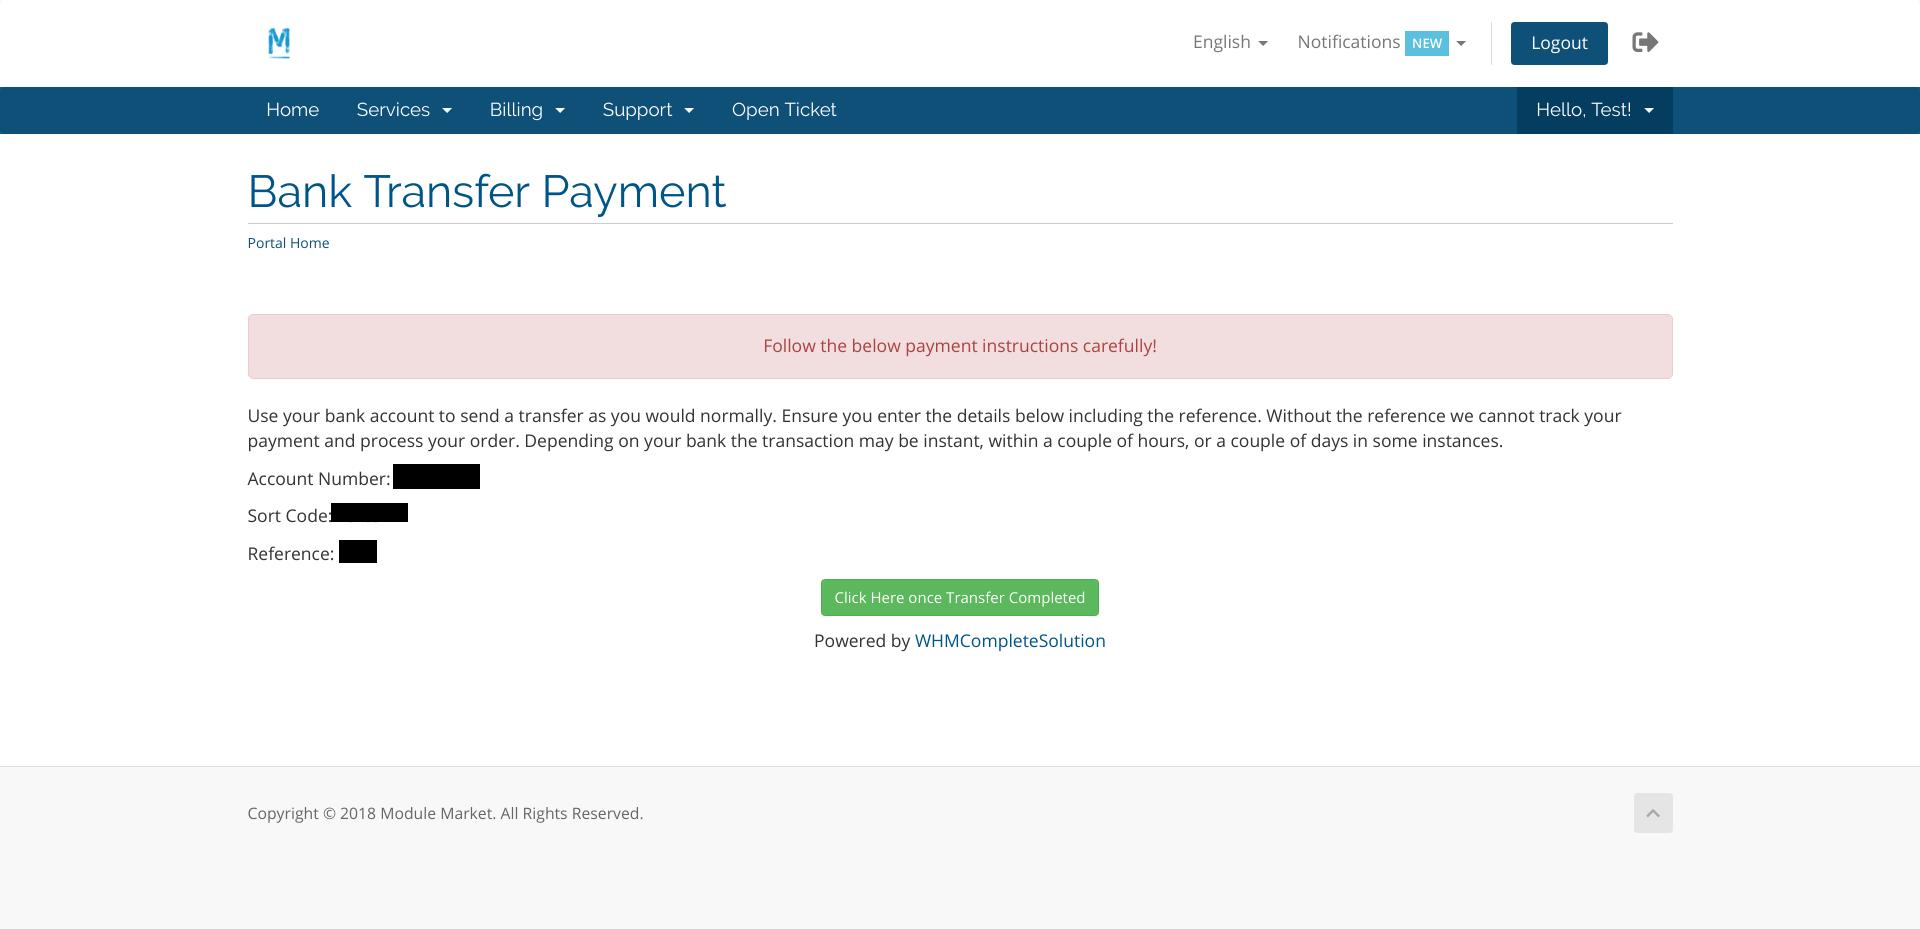 Auto Bank Transfer (Revolut) - WHMCS Marketplace